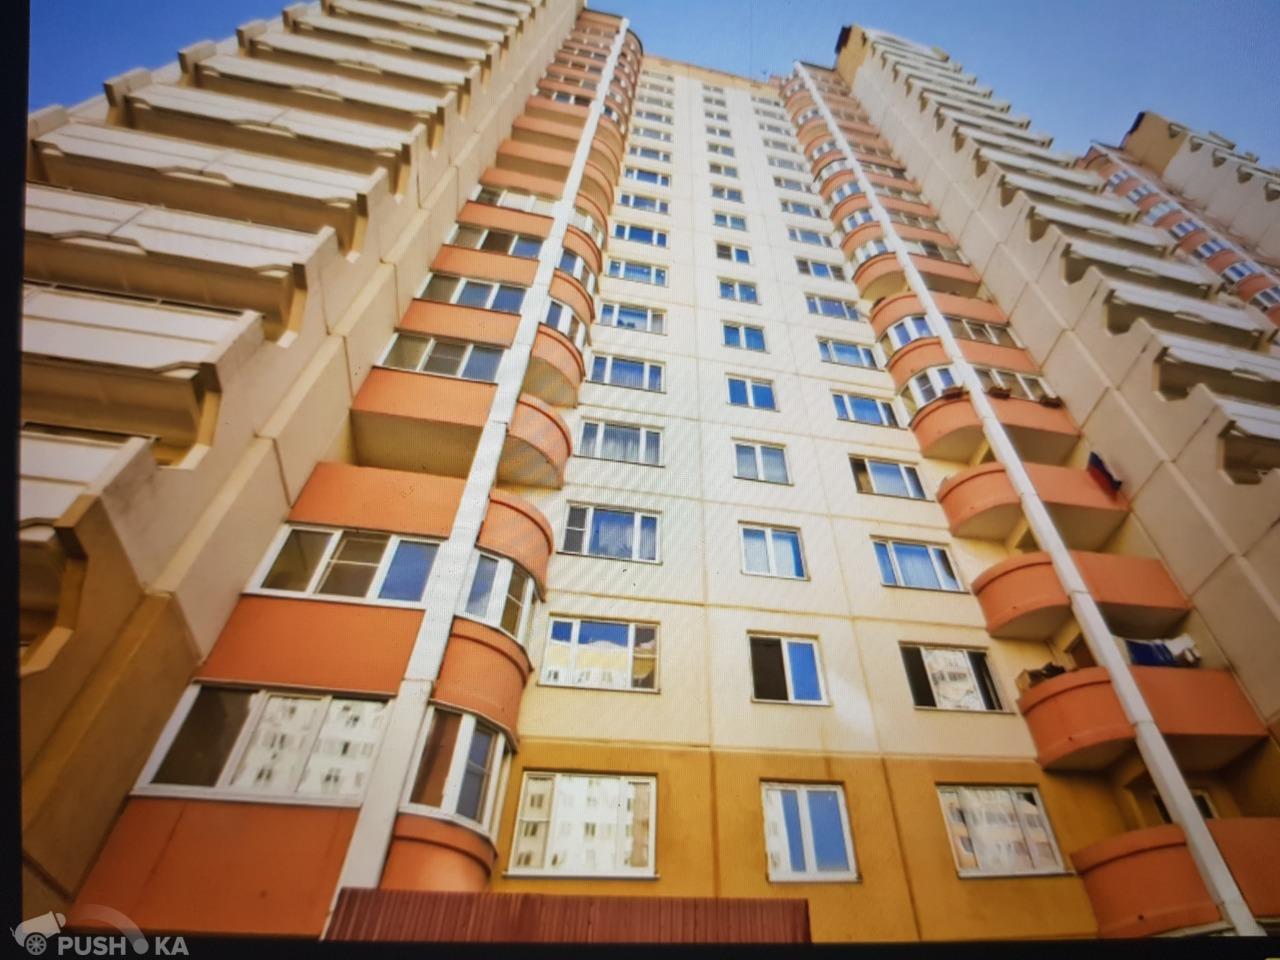 Сдаётся 1-комнатная квартира 40.0 кв.м. этаж 4/17 за 31 000 руб